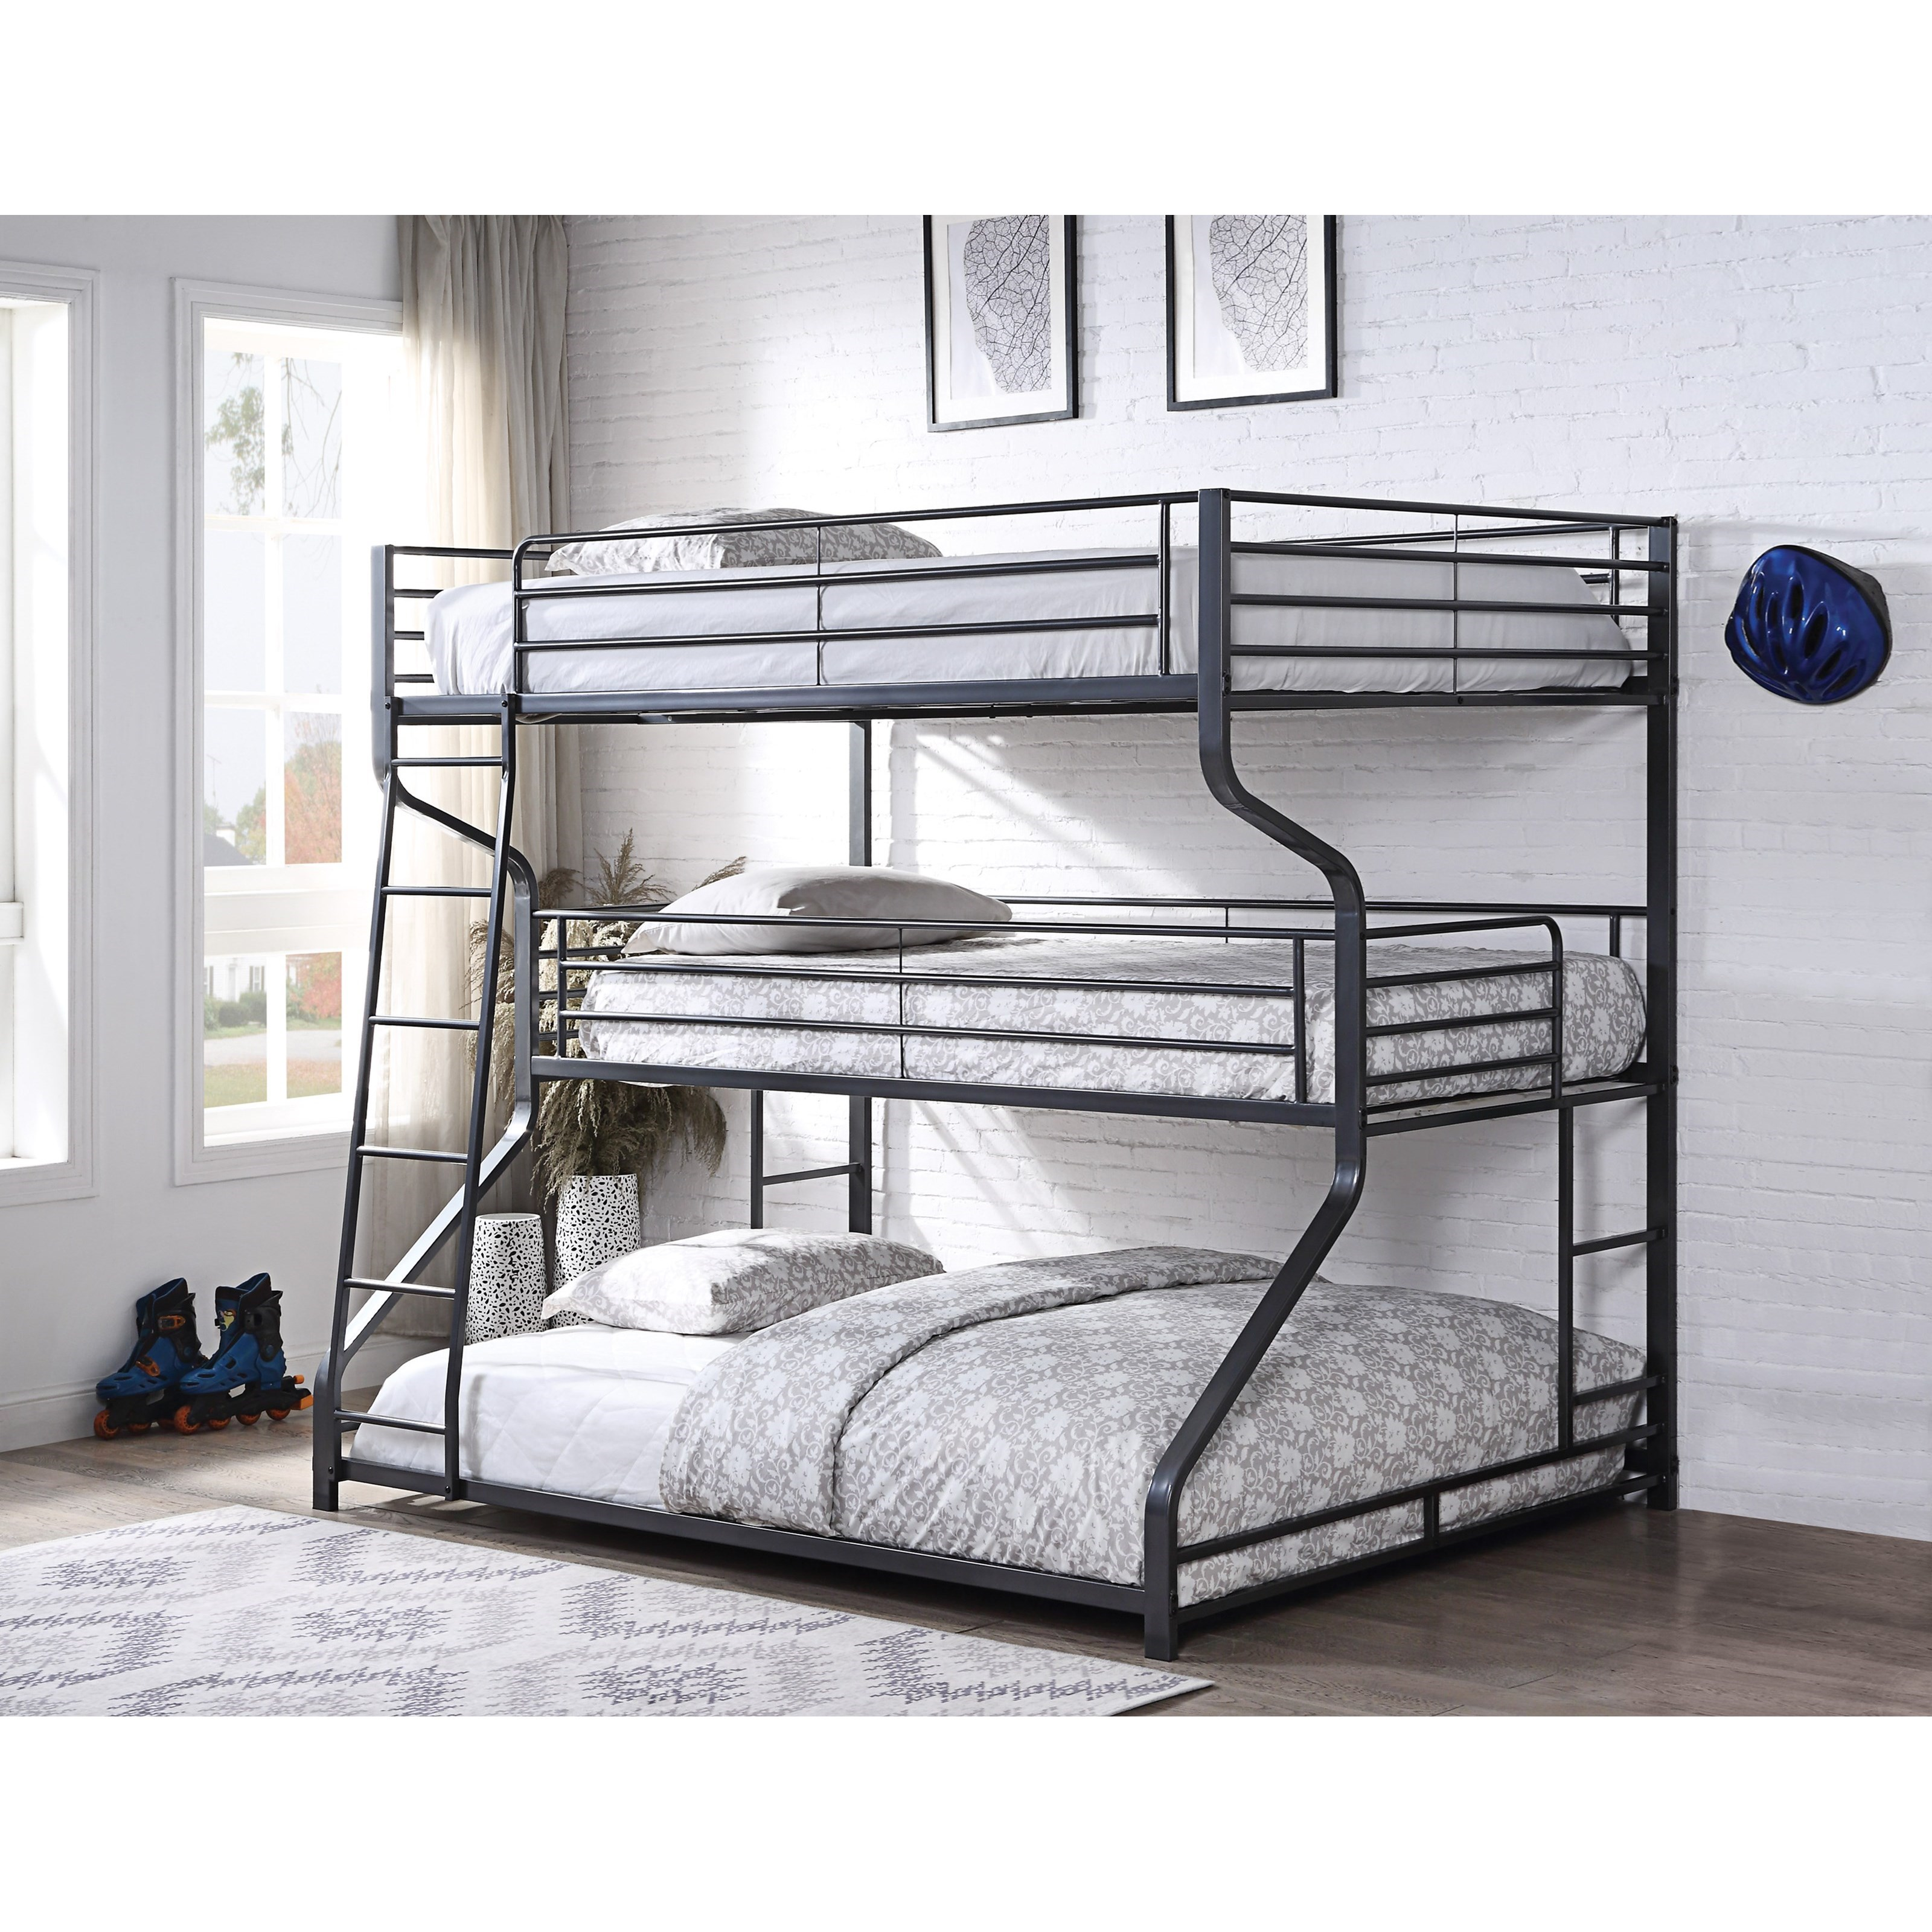 Picture of: Acme Furniture Caius Ii 37795 Metal Triple Bunk Bed Twin Full Queen Corner Furniture Bunk Beds